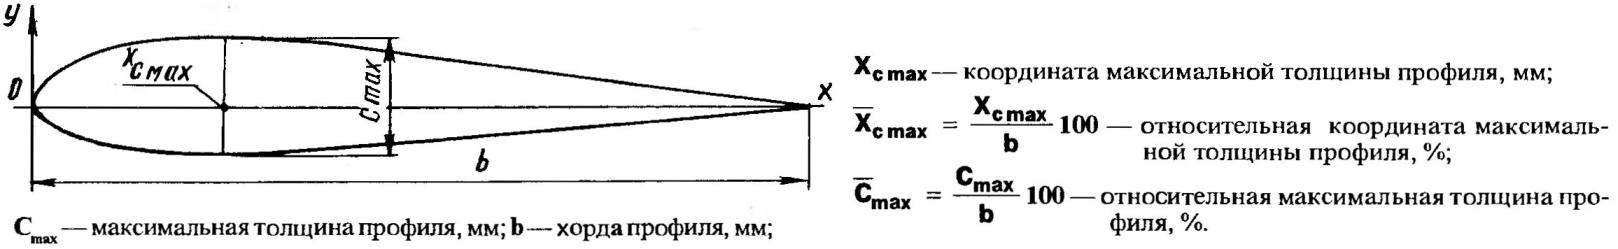 Характеристики профиля купола